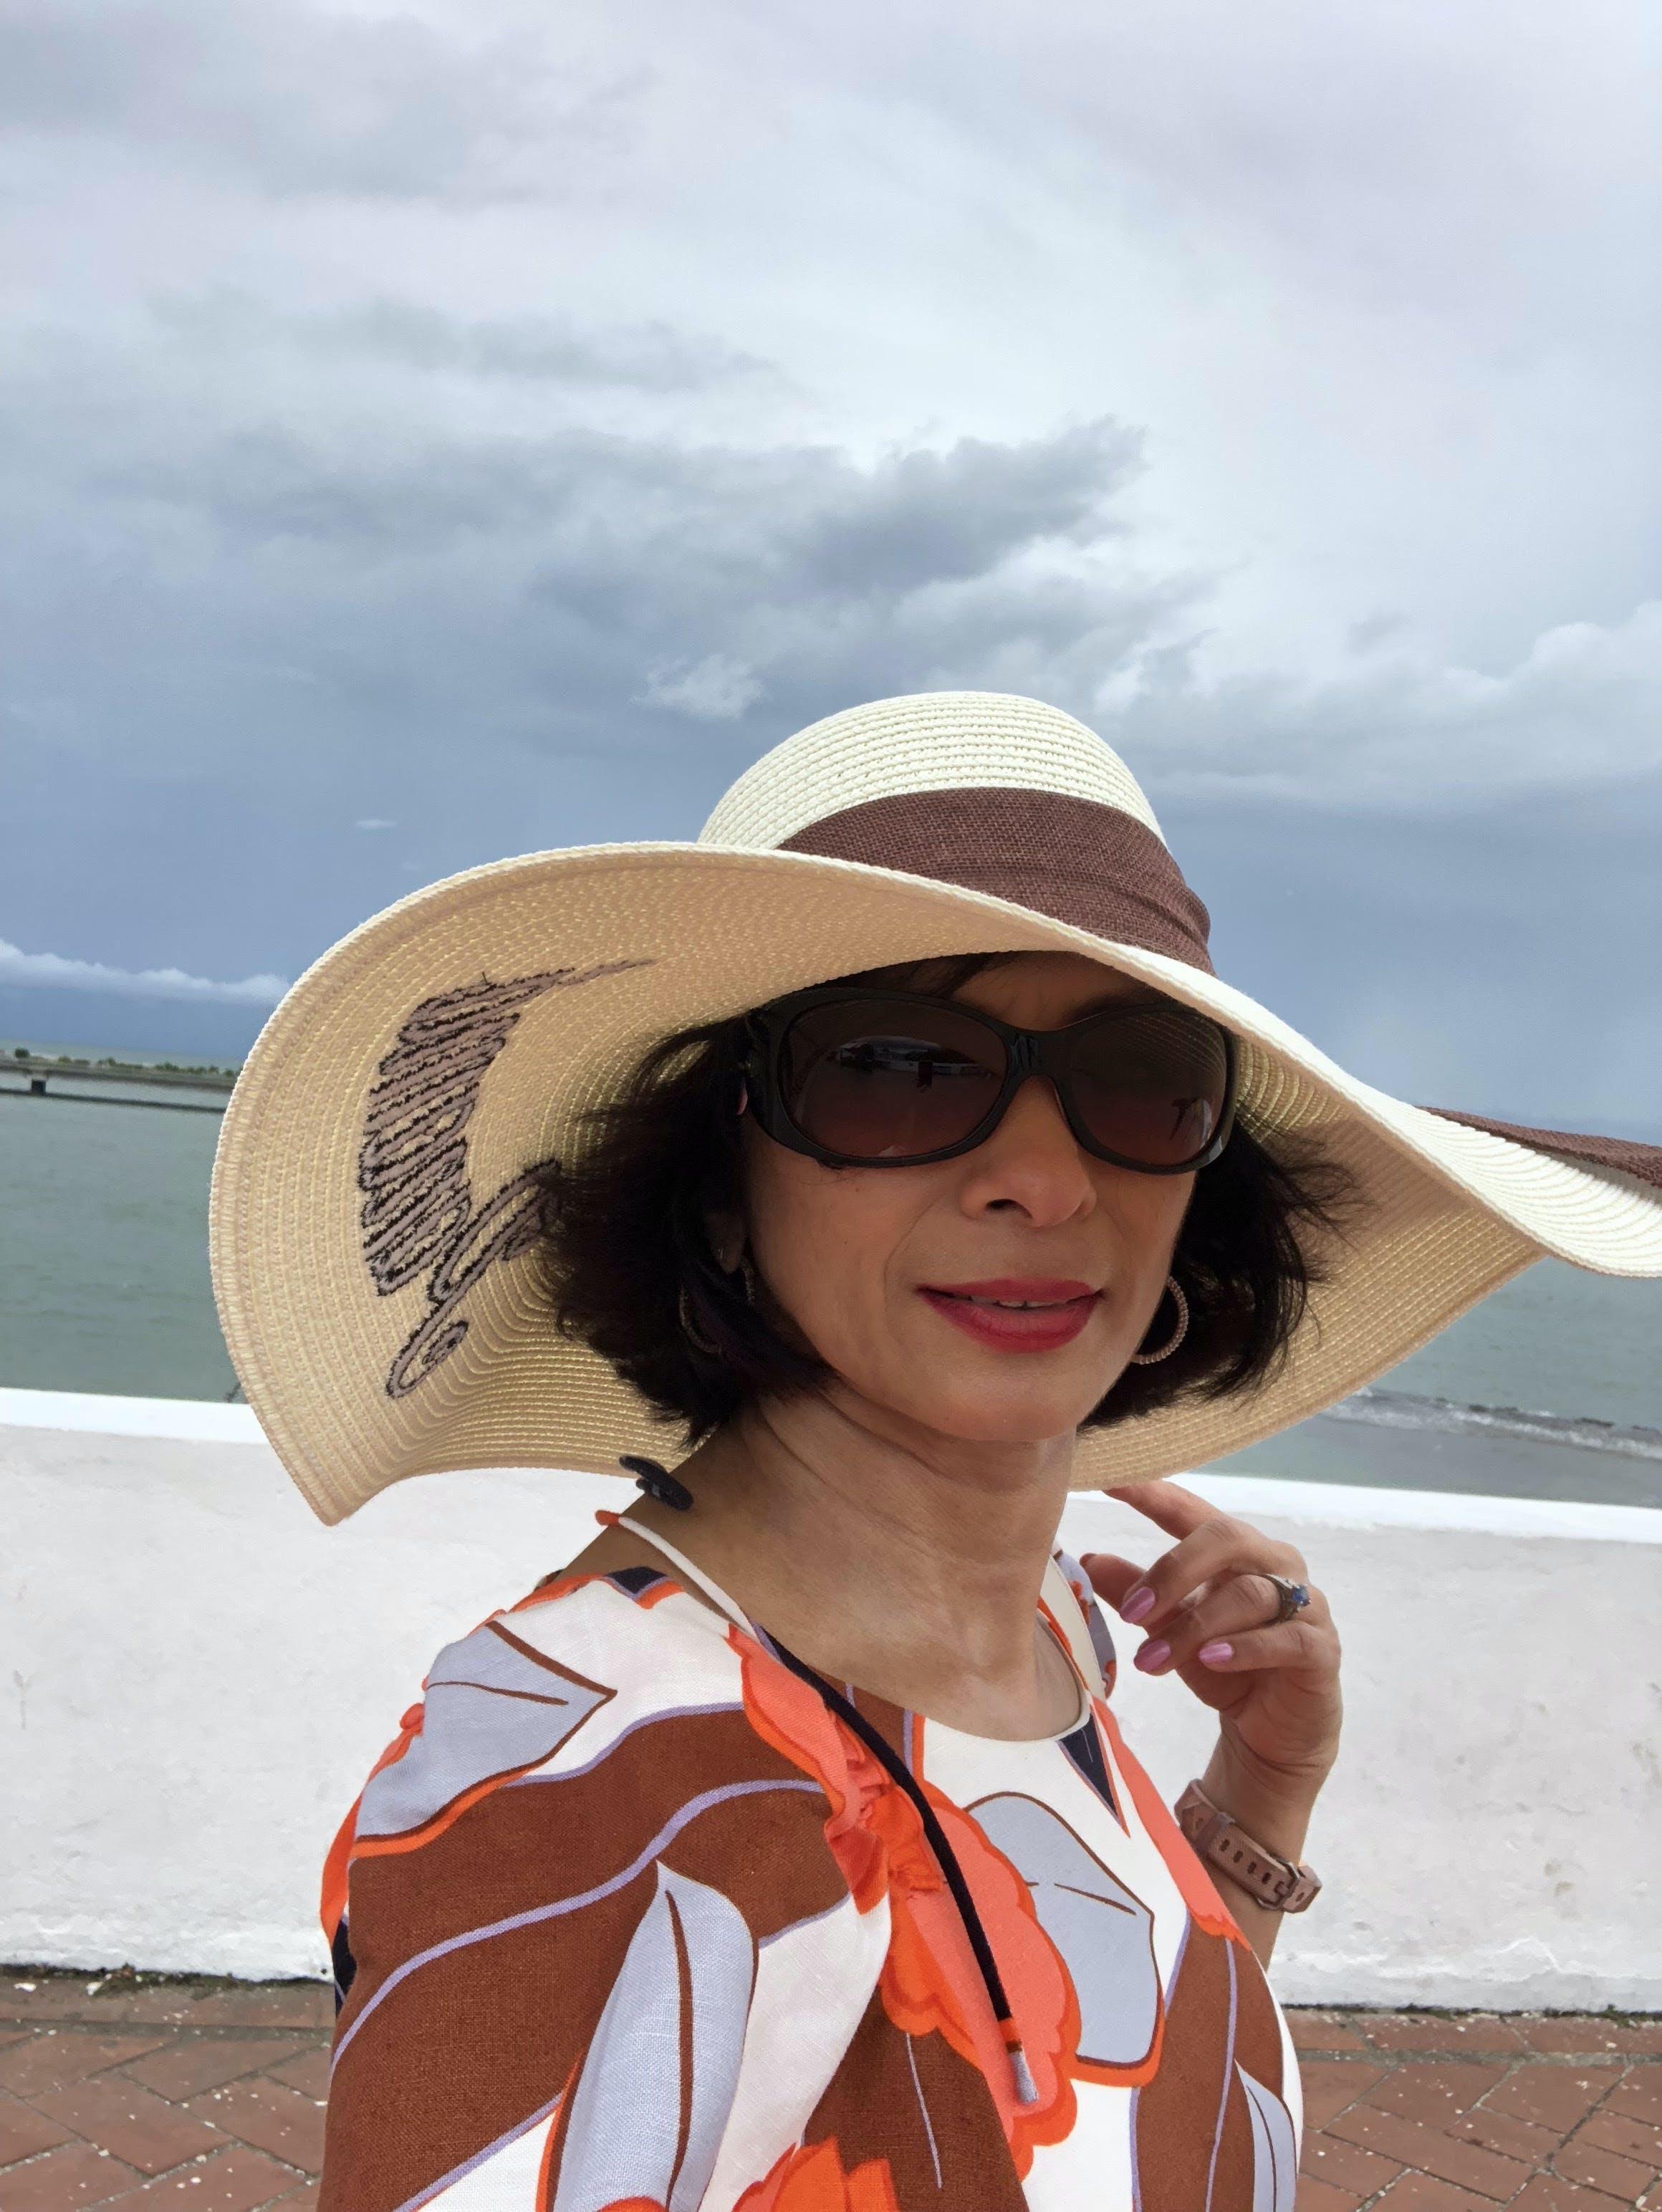 Seema Kumar for SEEMA, SEEMA Magazine, SEEMA blog, SEEMA network, SEEMA empowering South Asian women globally, SEEMA, Cancun, New Year resolutions, SEEMA 2019